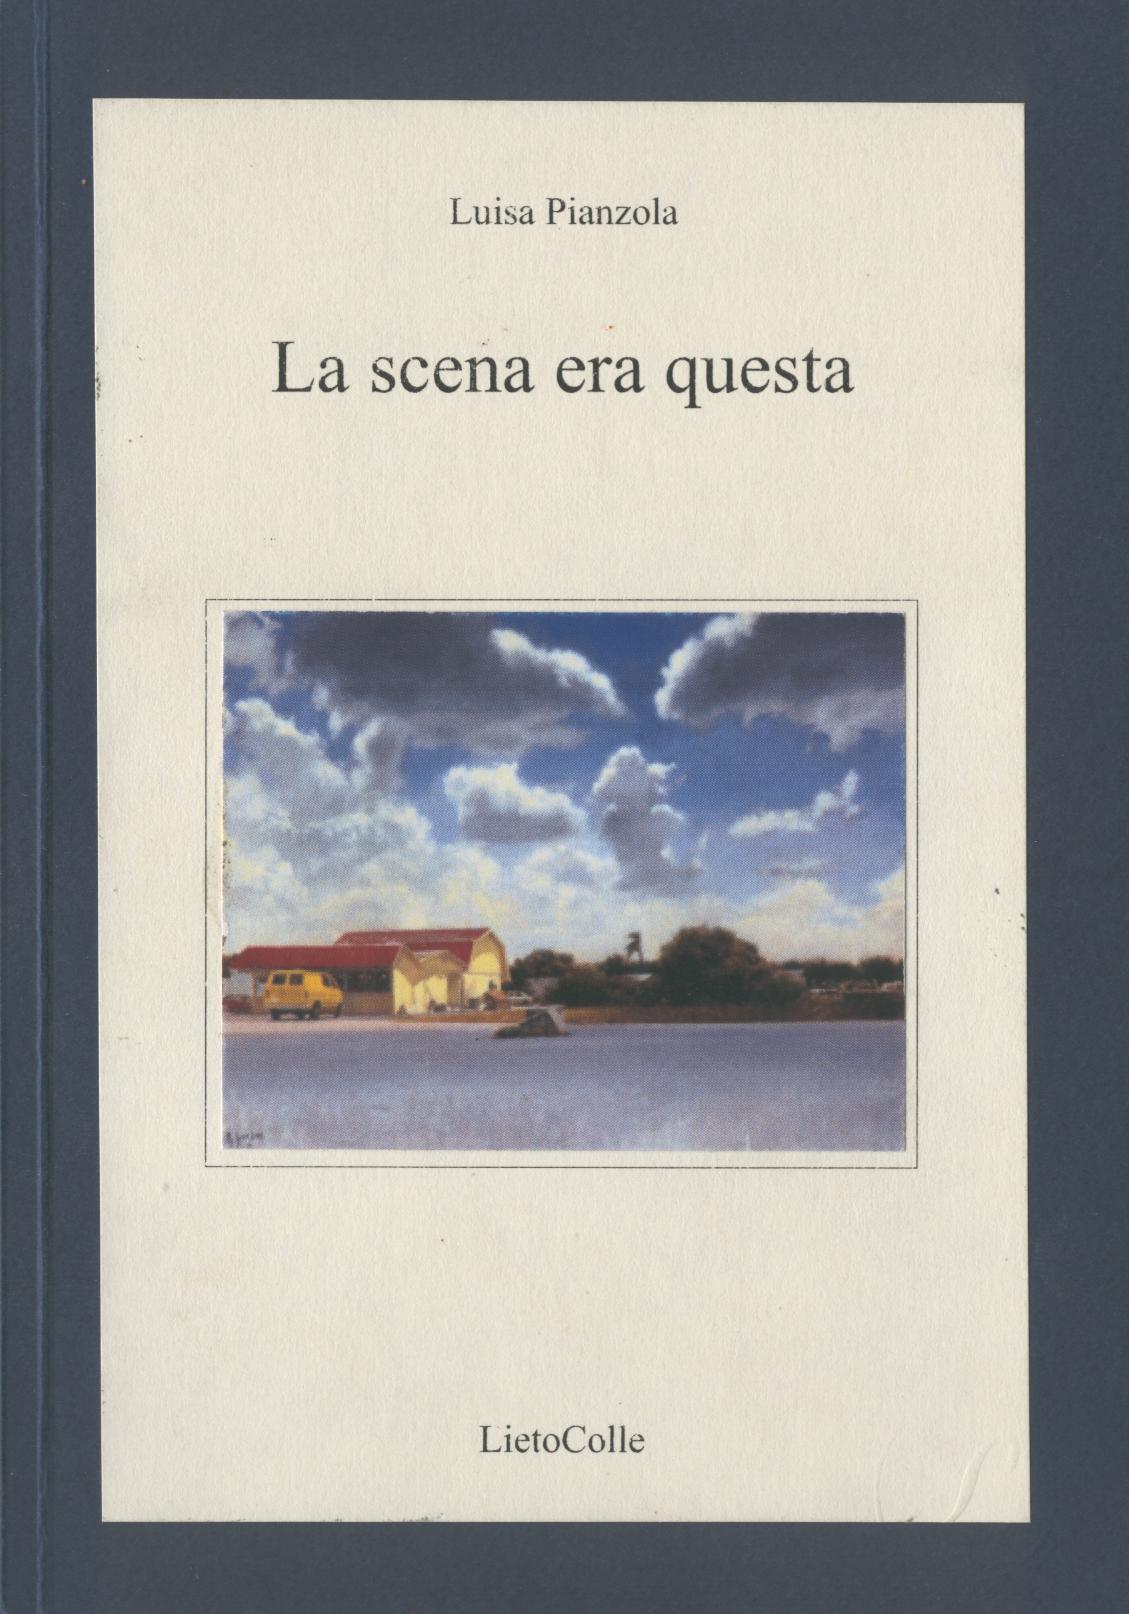 La Scena Era Questa, Luisa Pianzola